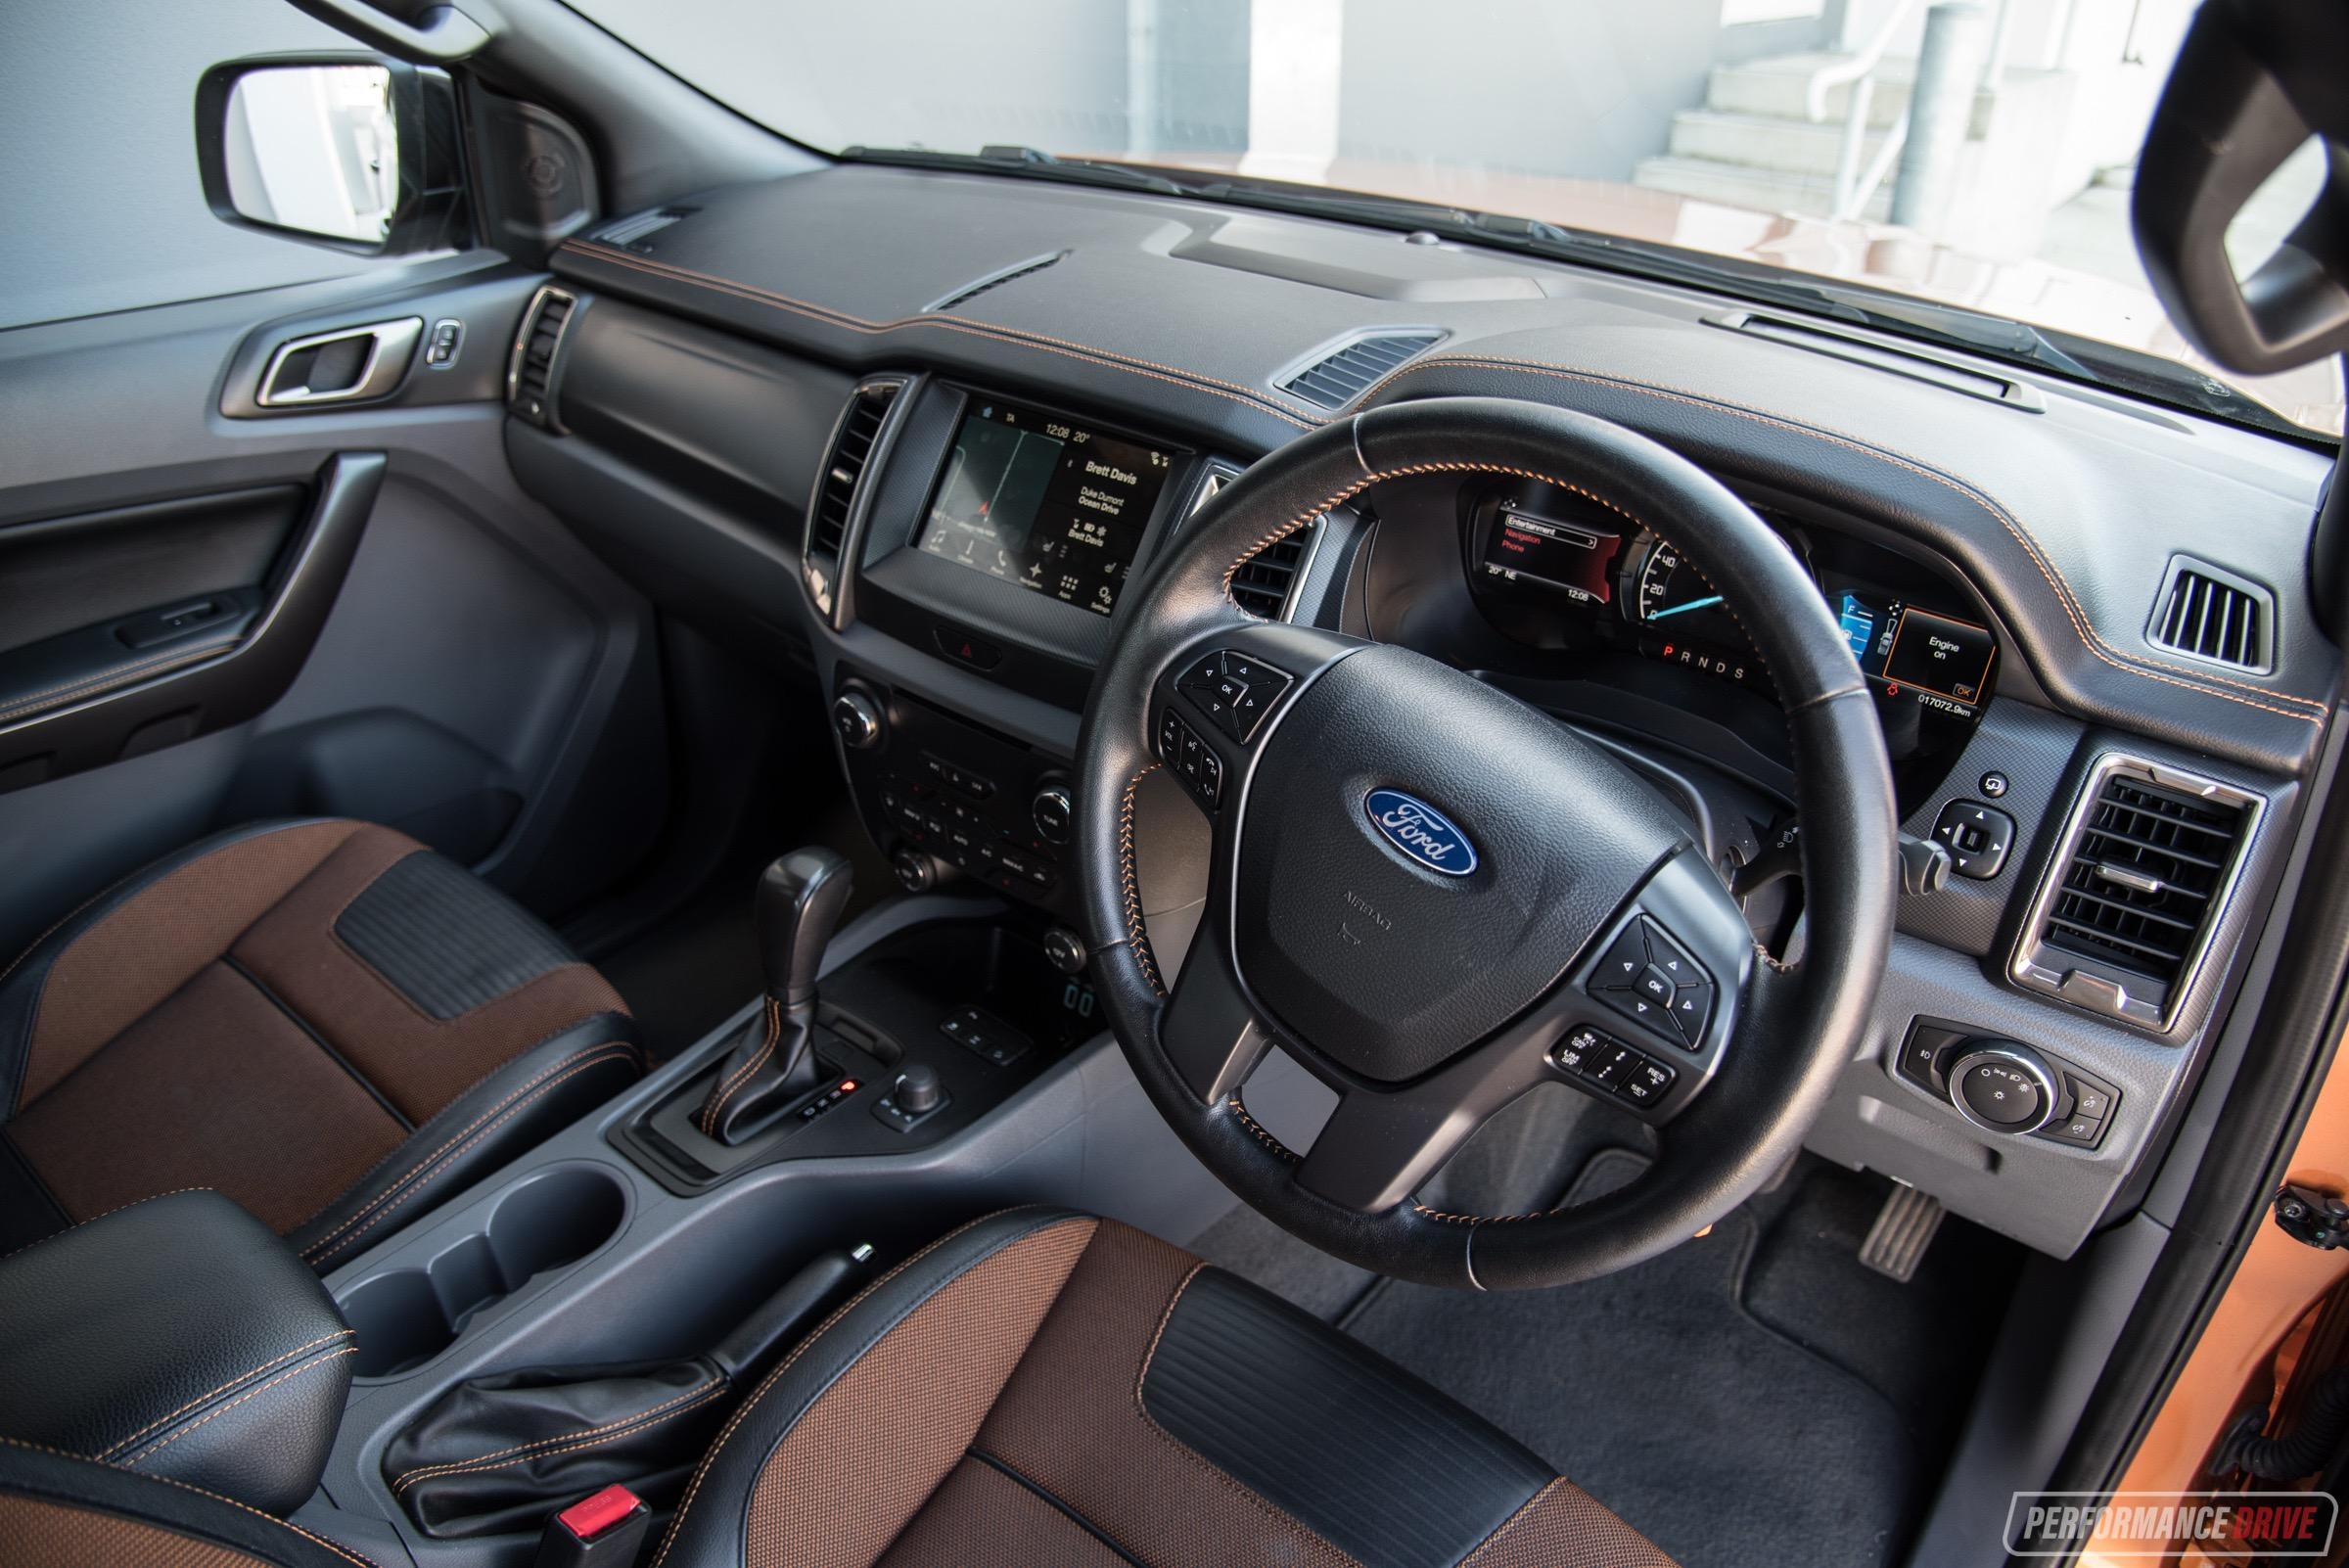 2017 Ford Ranger Wildtrak review (video) | PerformanceDrive